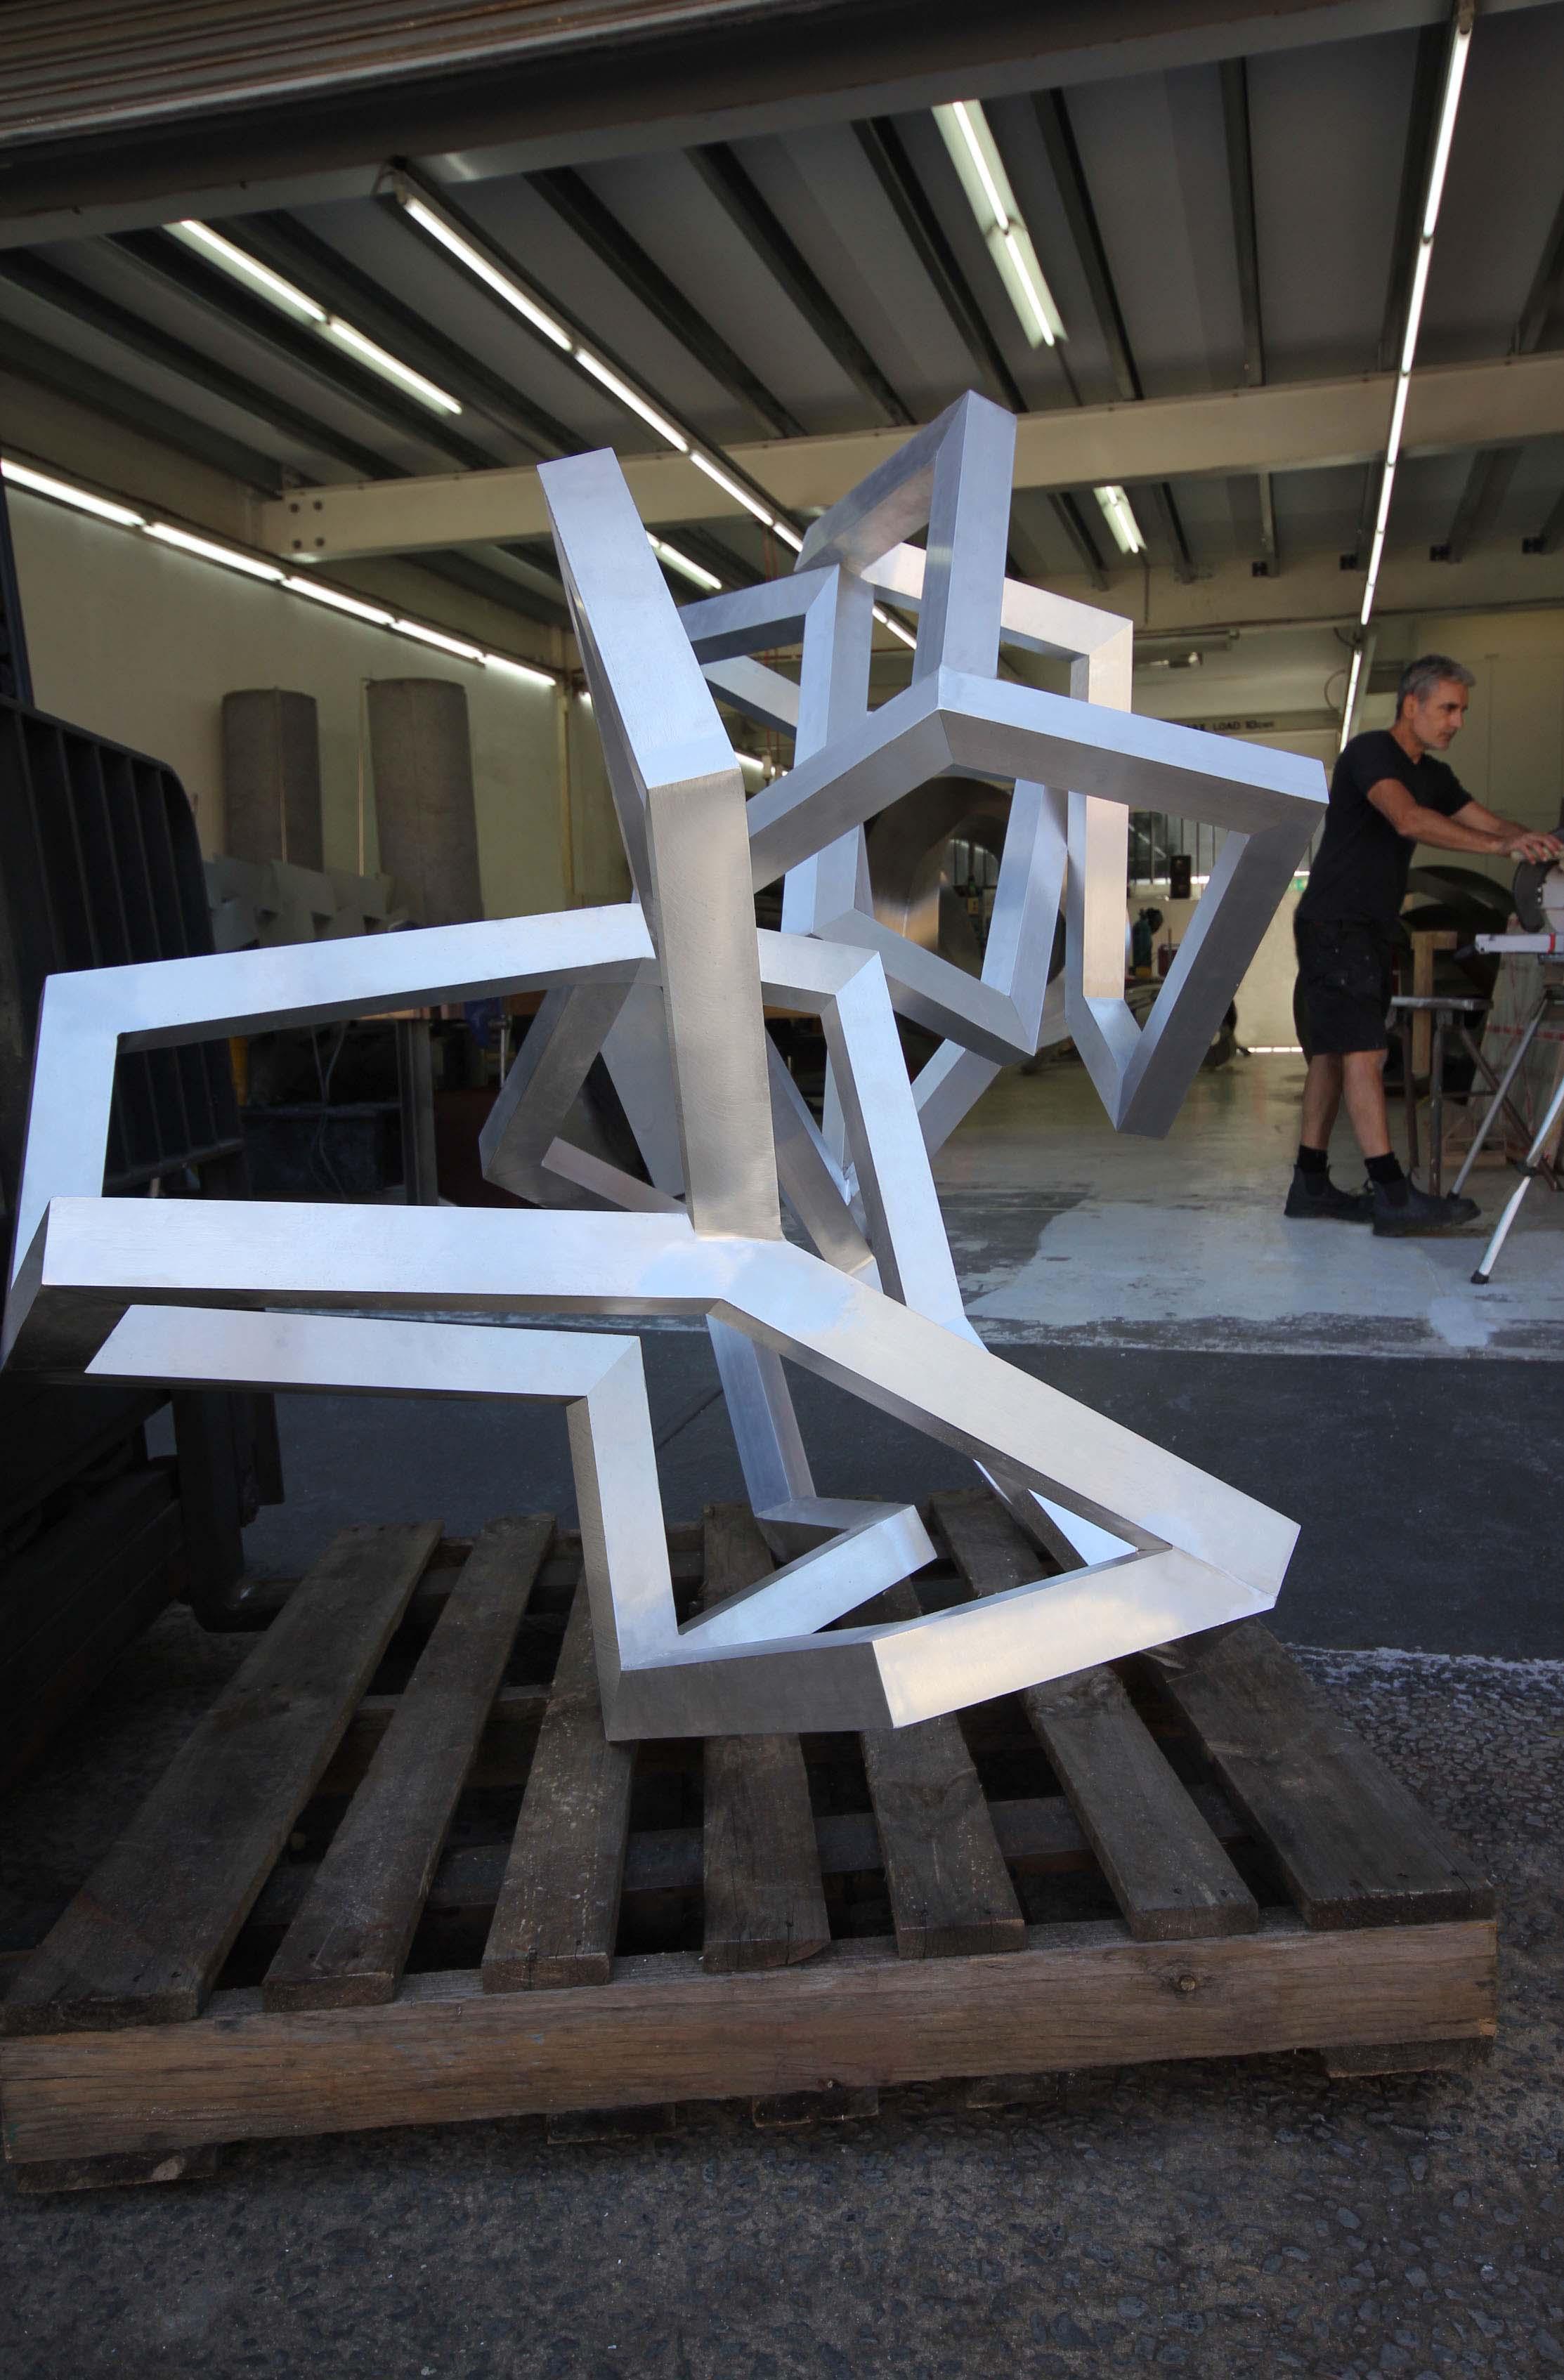 korban flaubert_arid in workshop